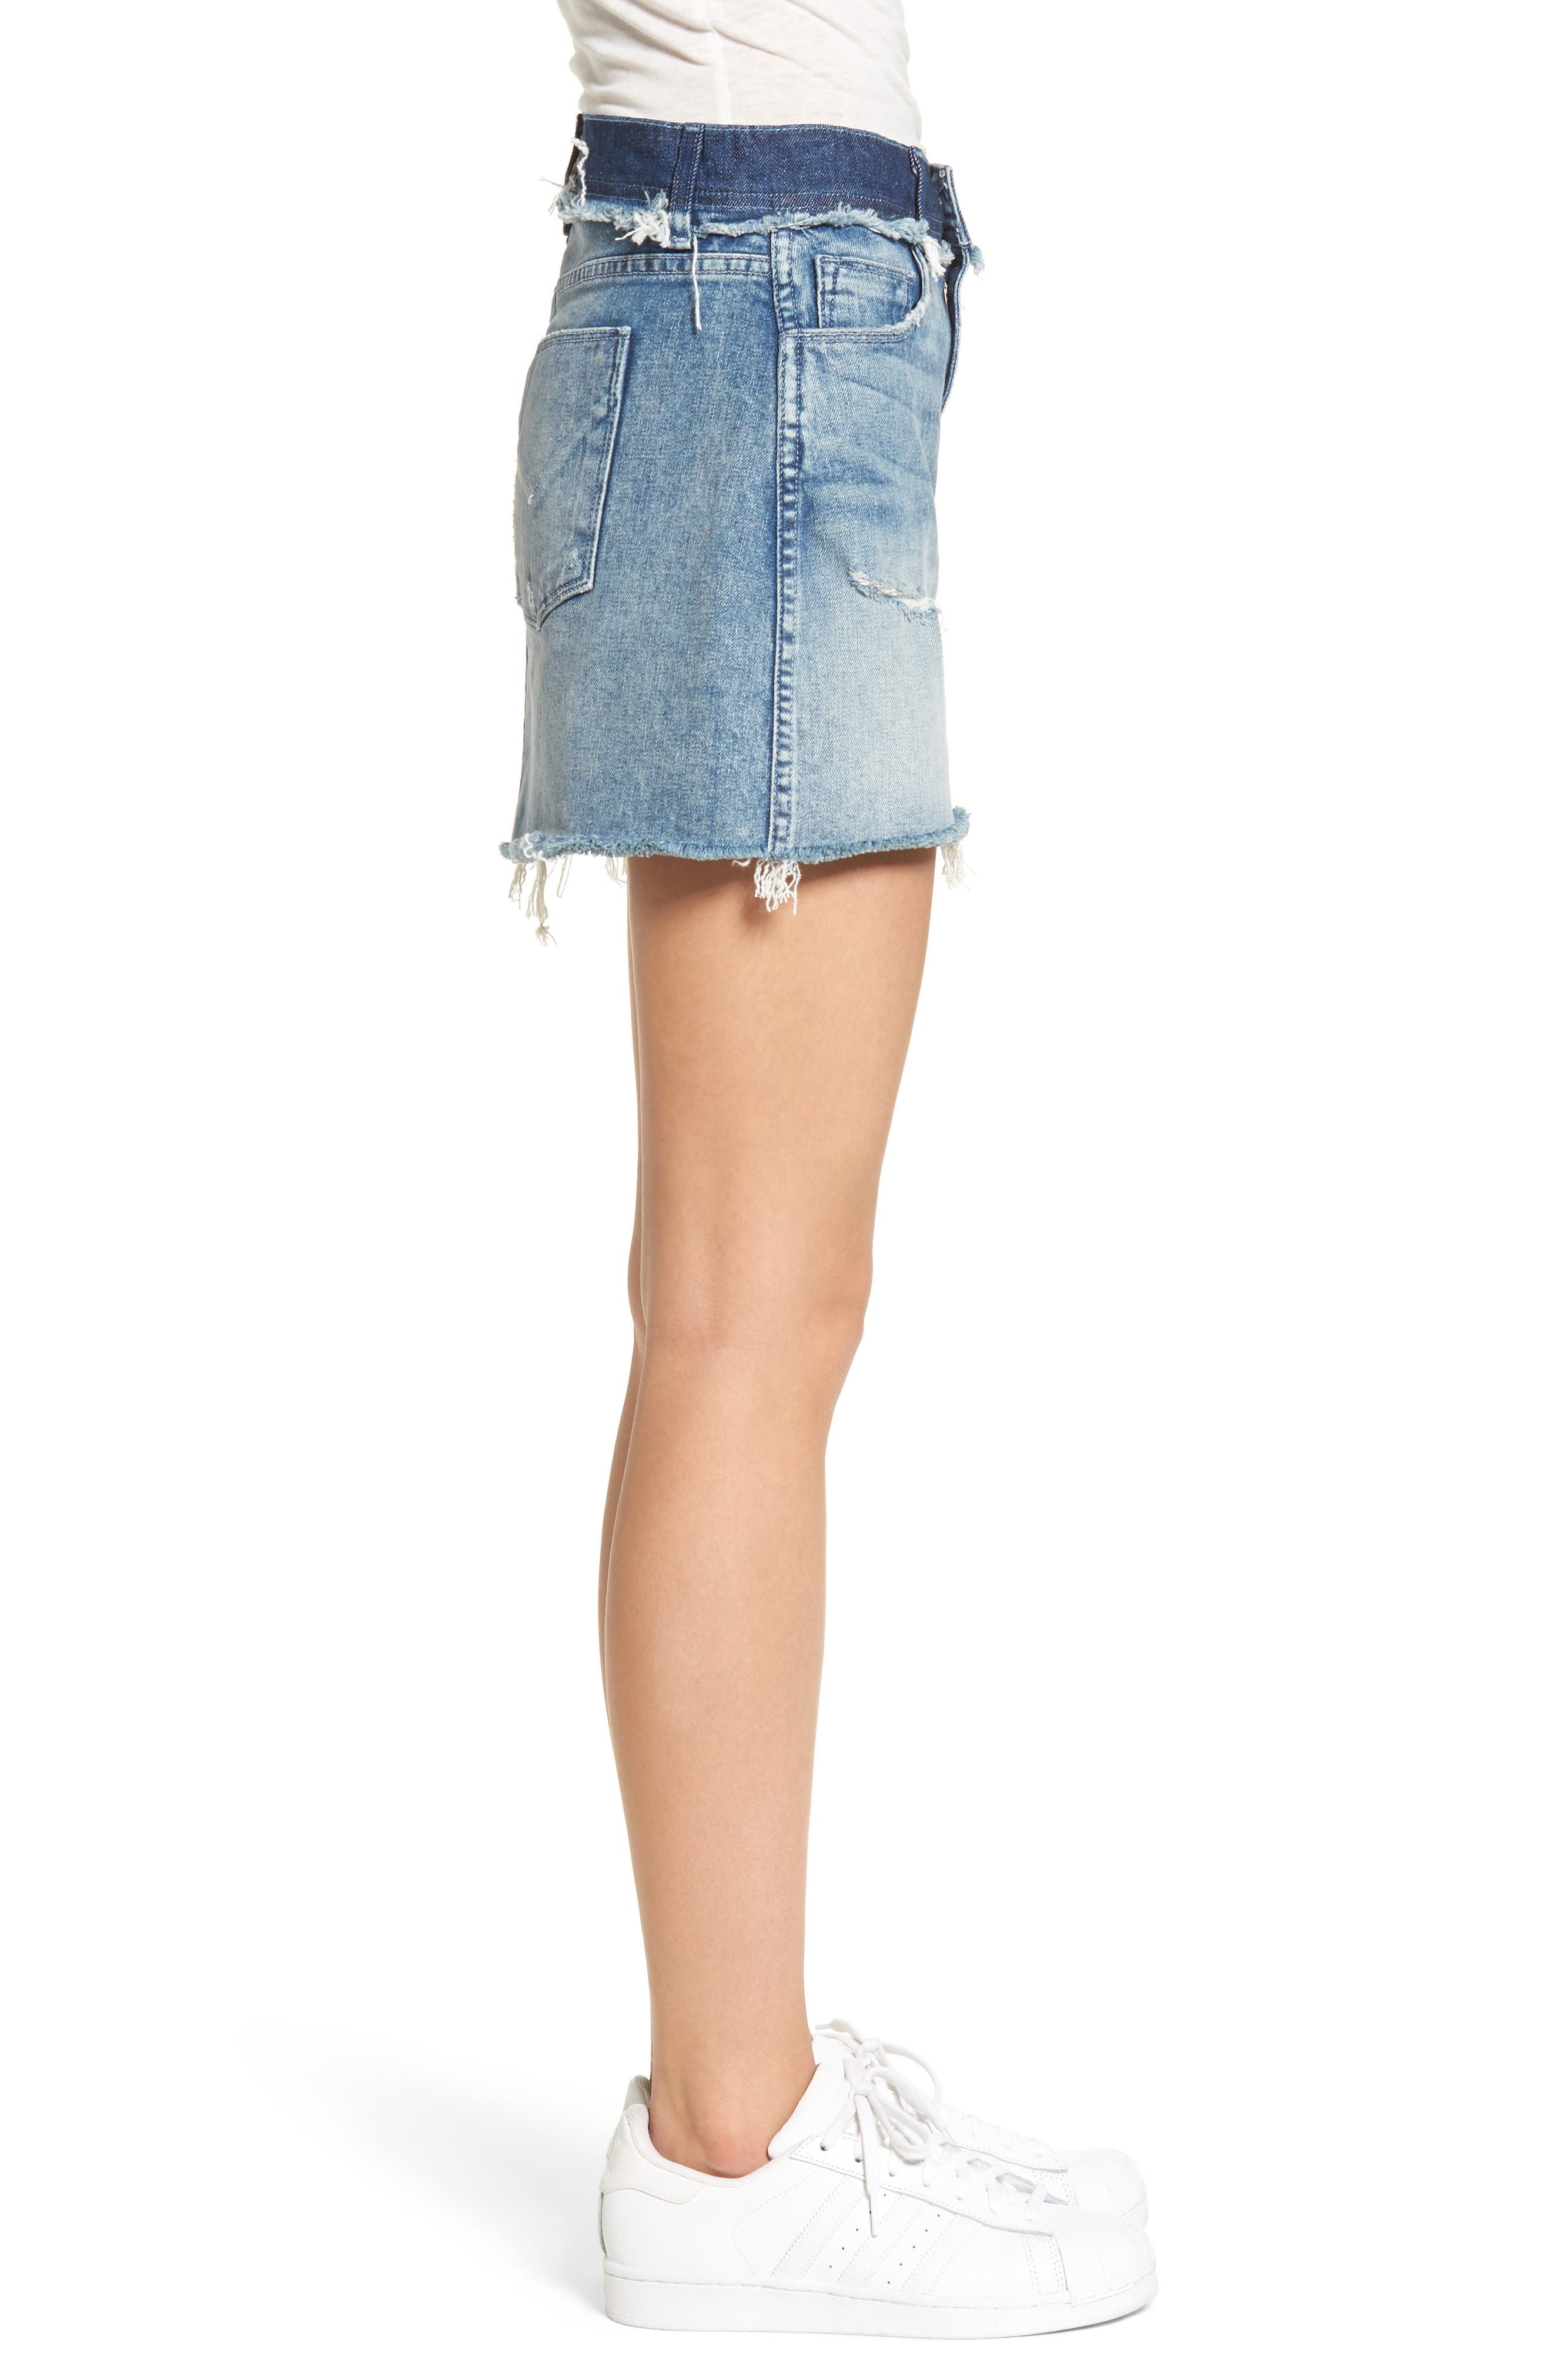 Vivid Cutoff Denim Miniskirt,                             Alternate thumbnail 3, color,                             Rock Steady